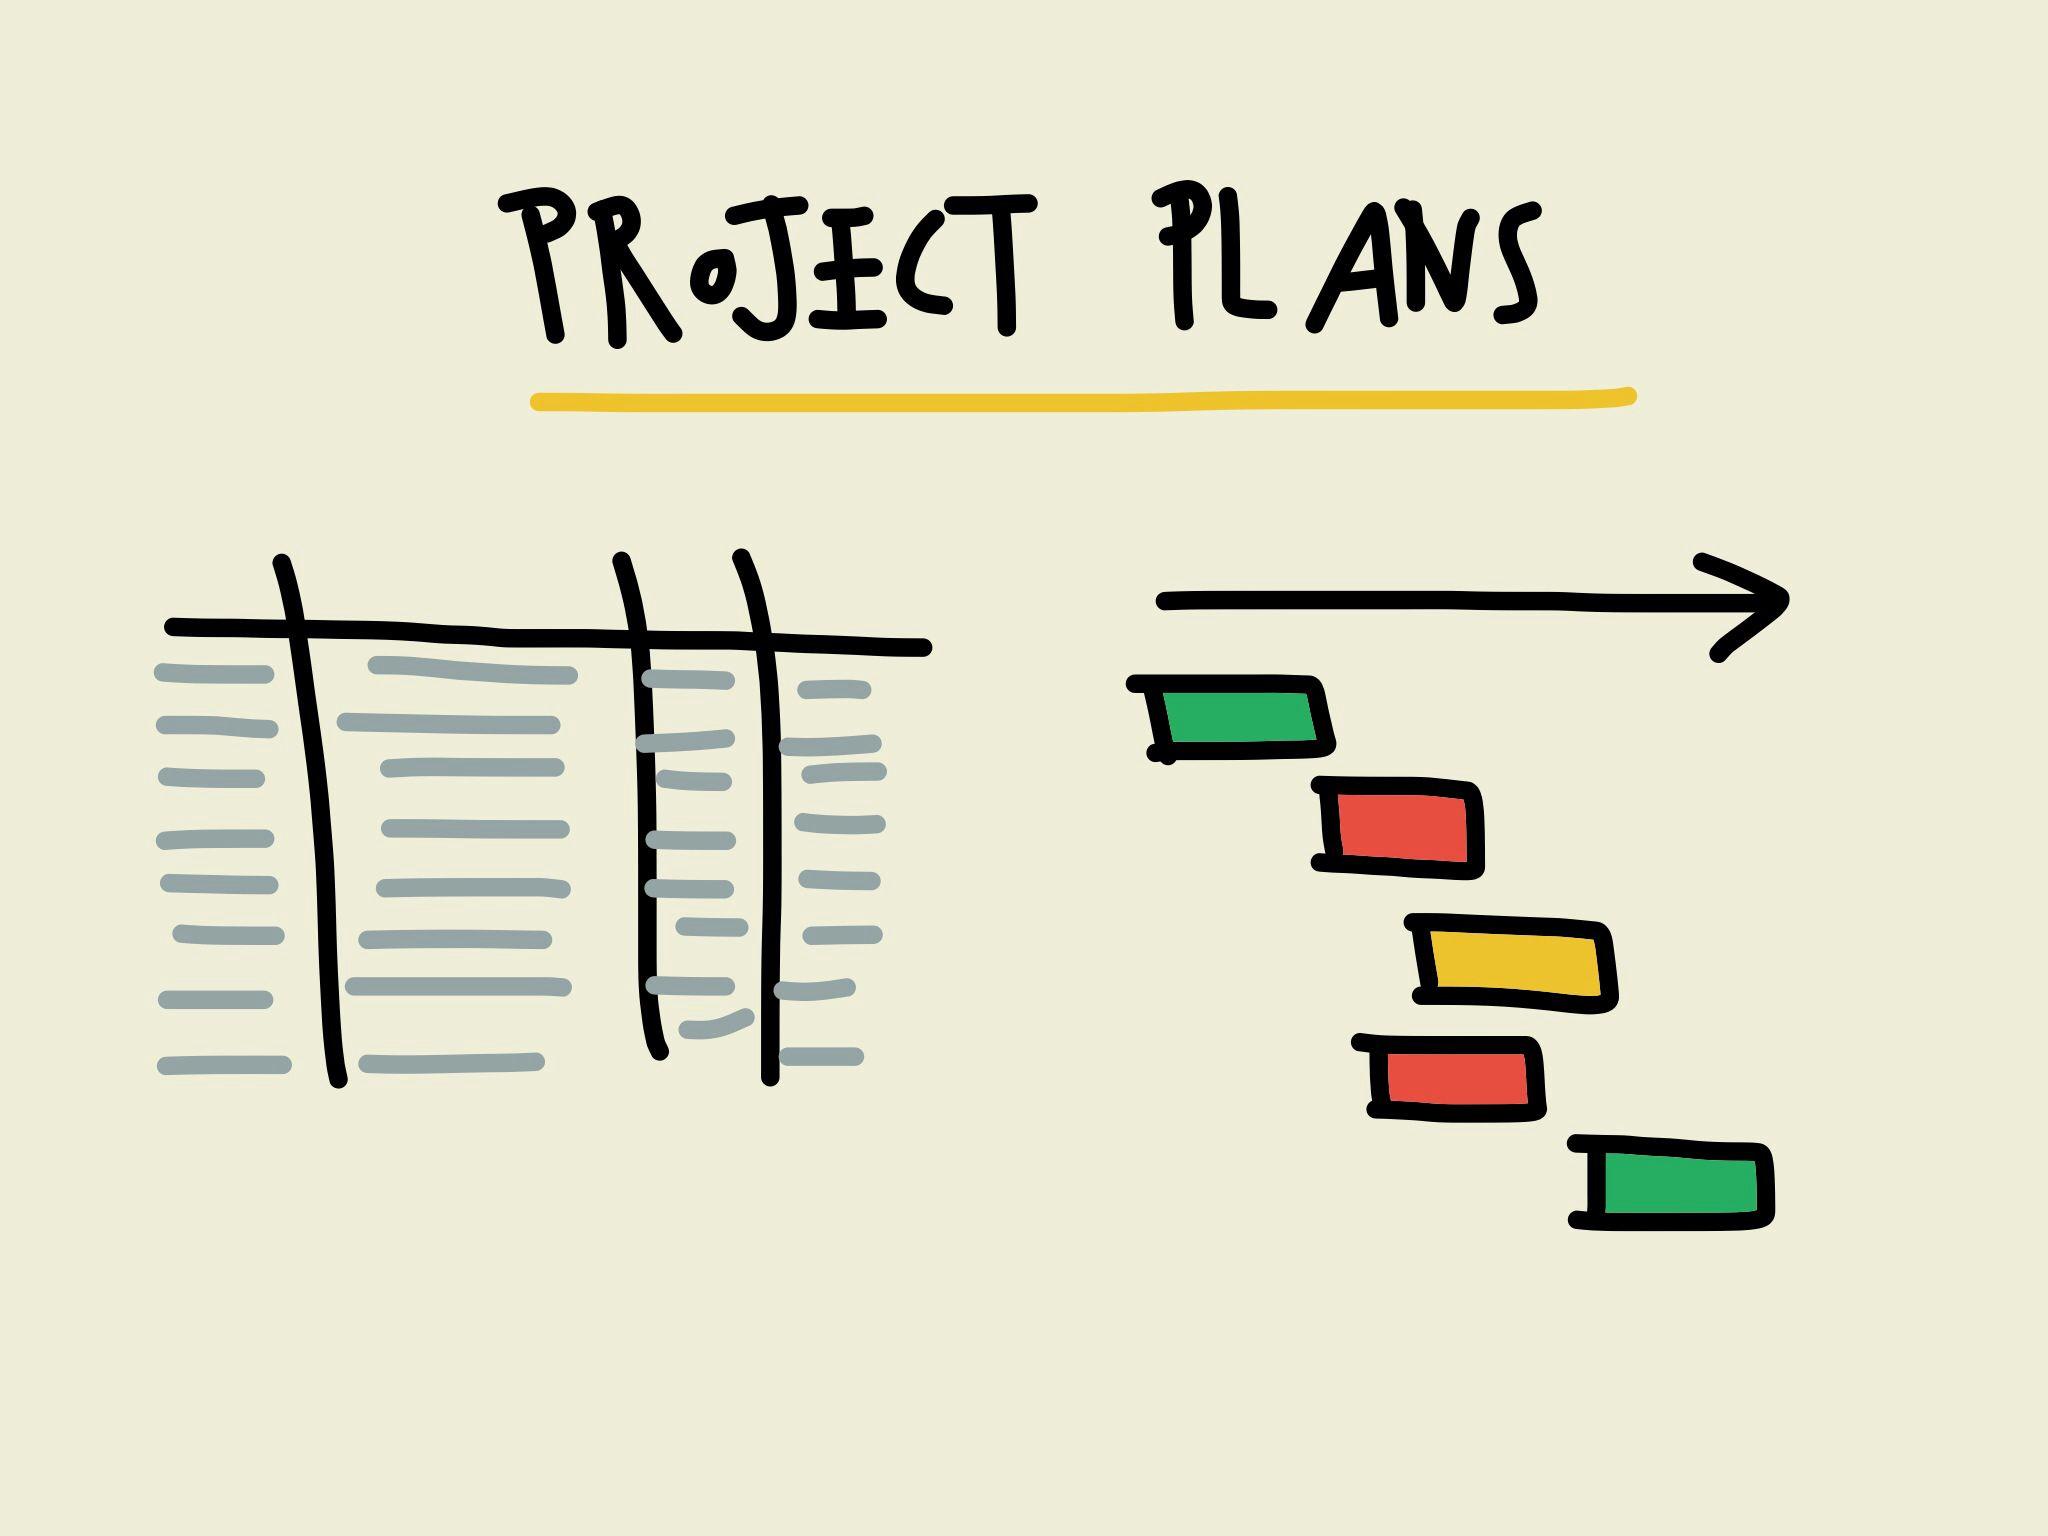 Gantt charts make project plans clearer pictures pinterest explore gantt chart project management and more nvjuhfo Choice Image